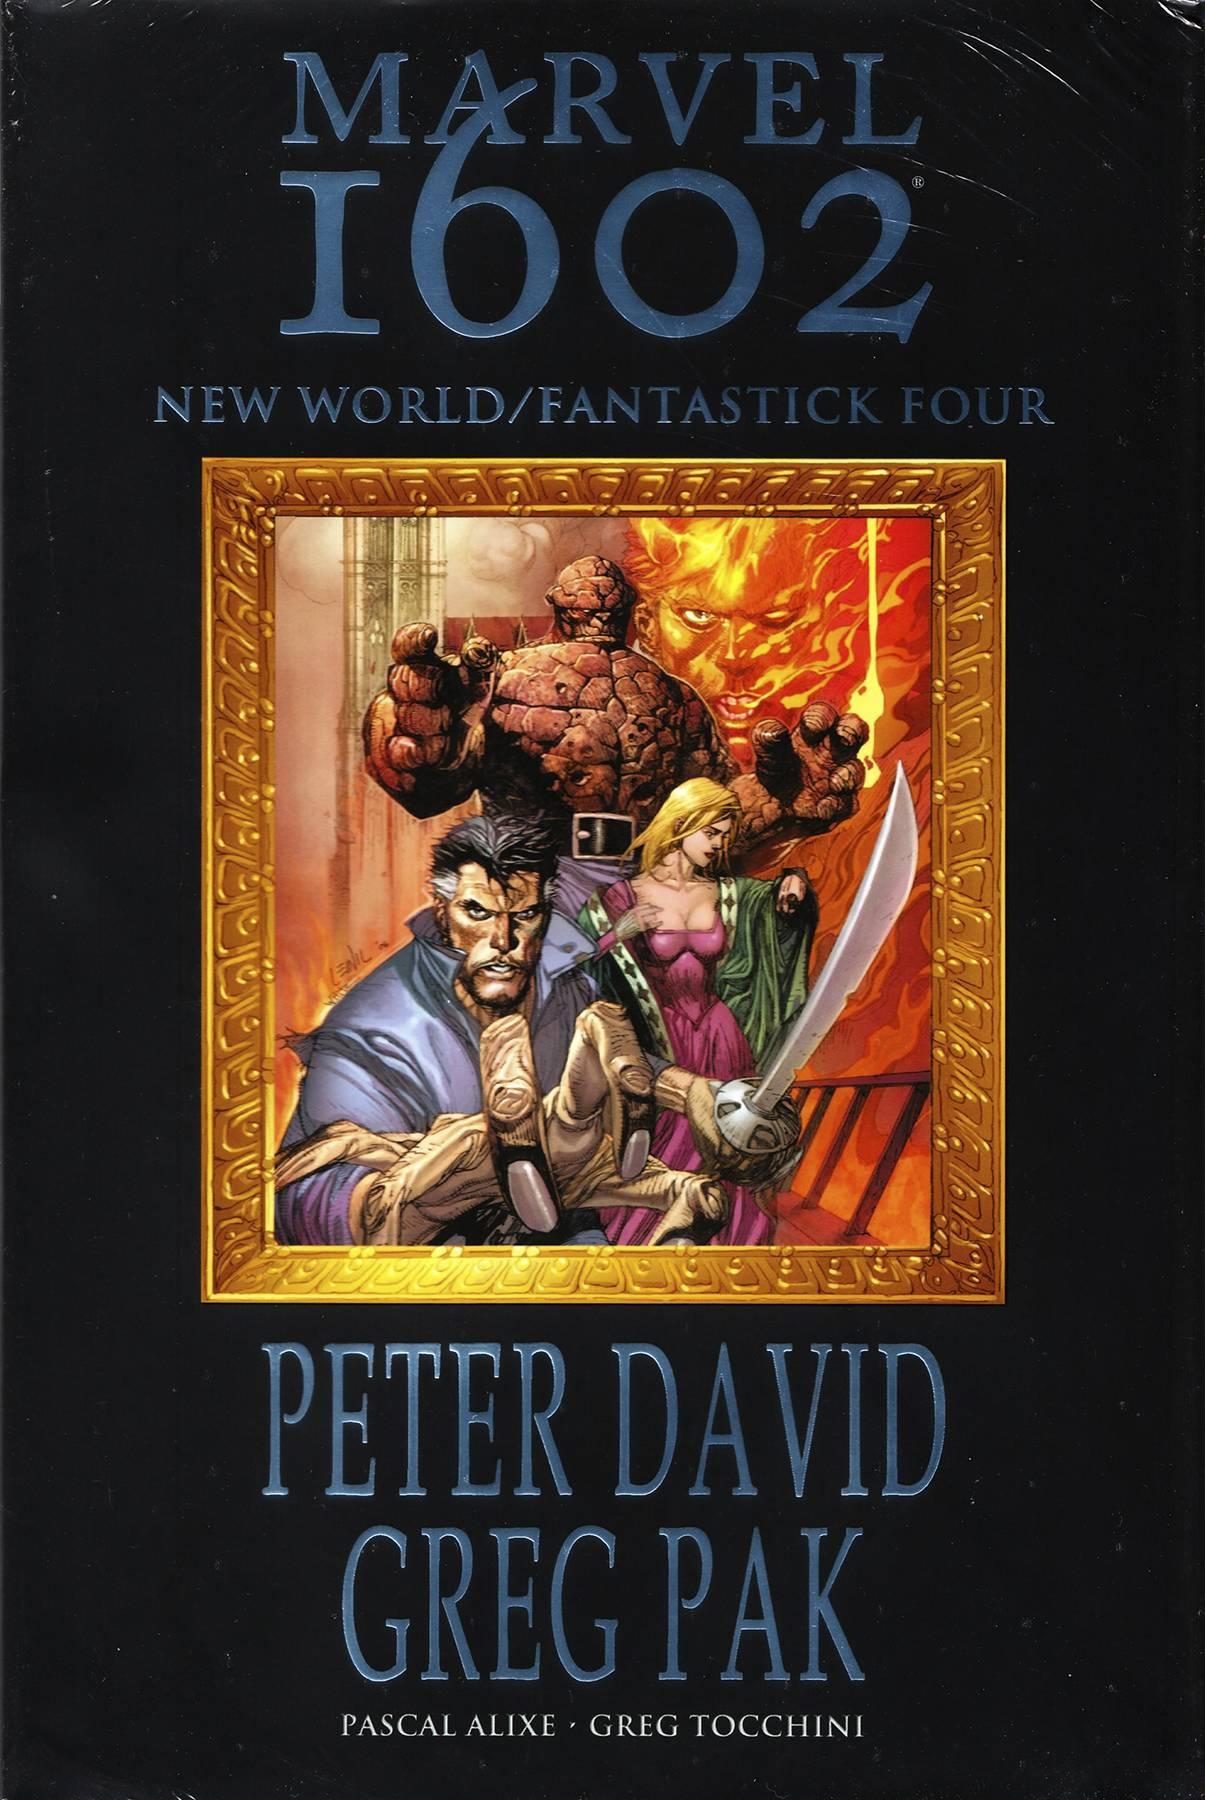 MARVEL 1602 PREM HC NEW WORLD FANTASTICK FOUR